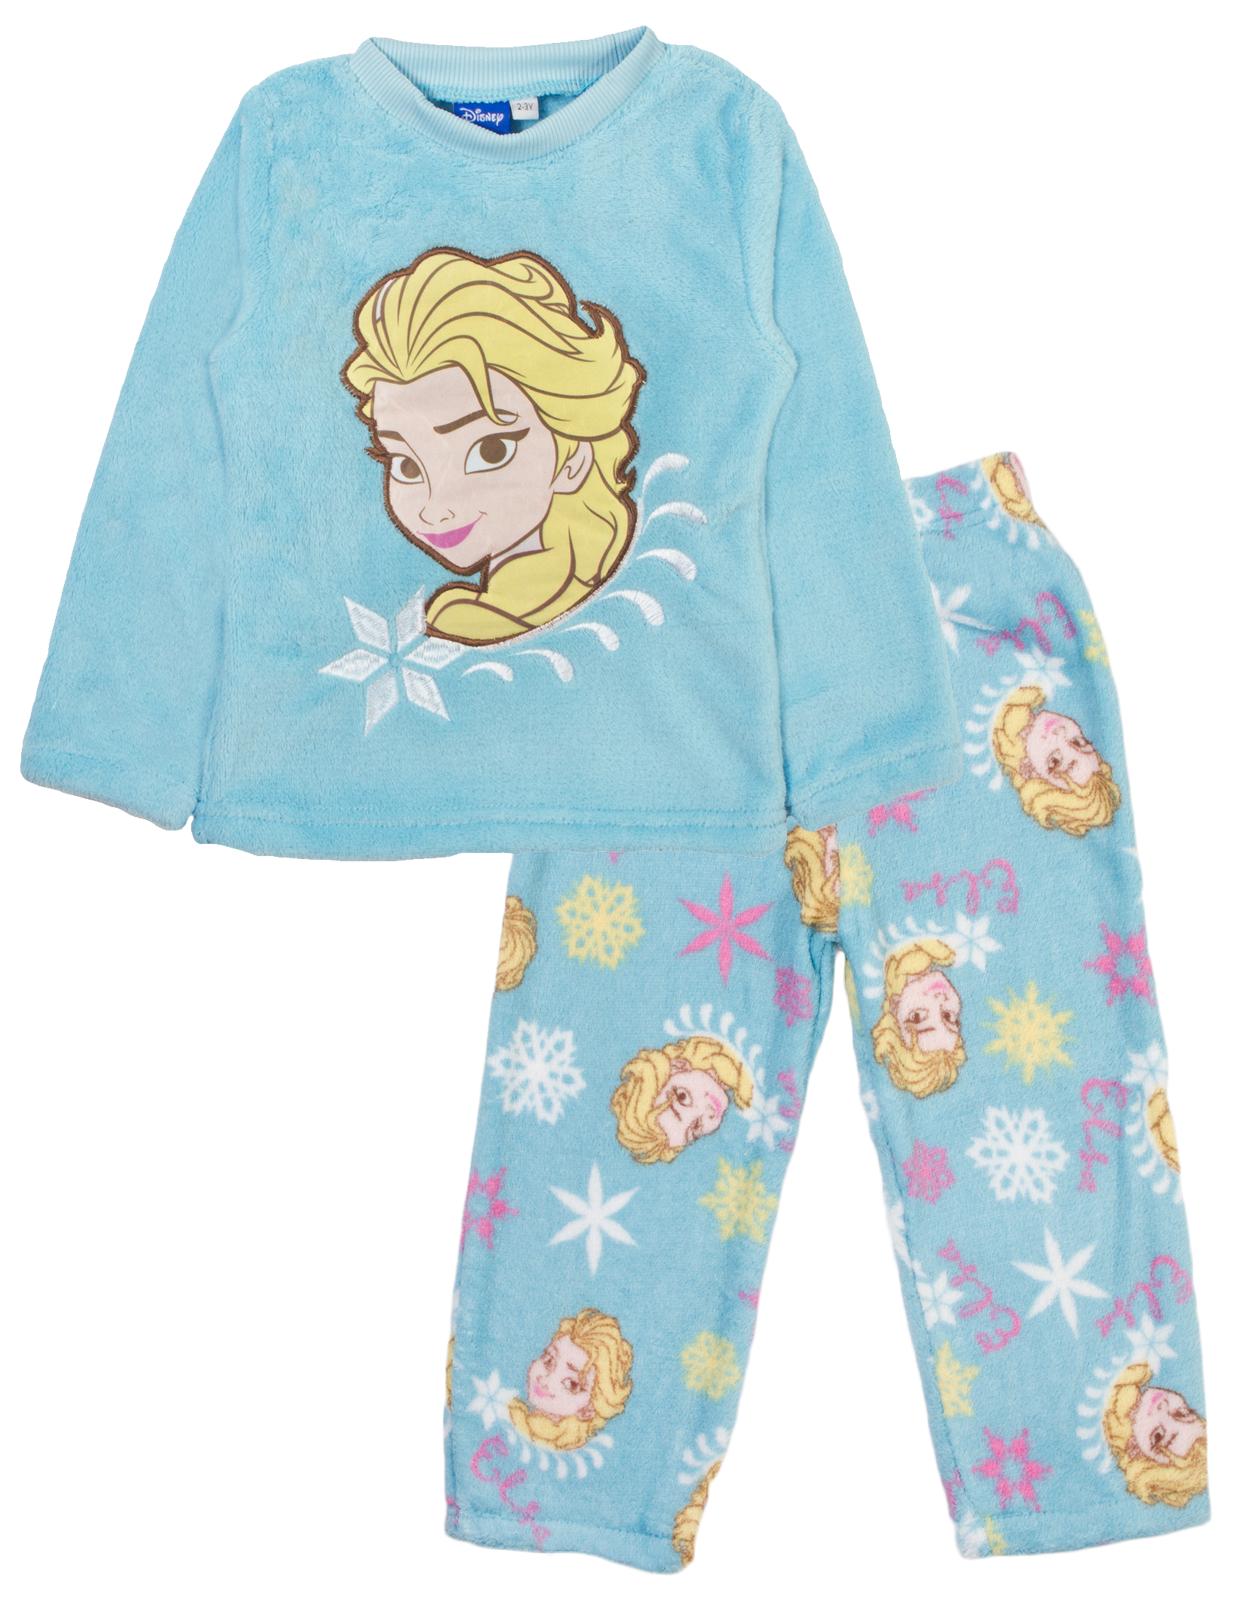 28a98a1ad Girls Boys Minions Peppa Pig Frozen Fleece Pyjamas Twosie Pjs Lounge ...